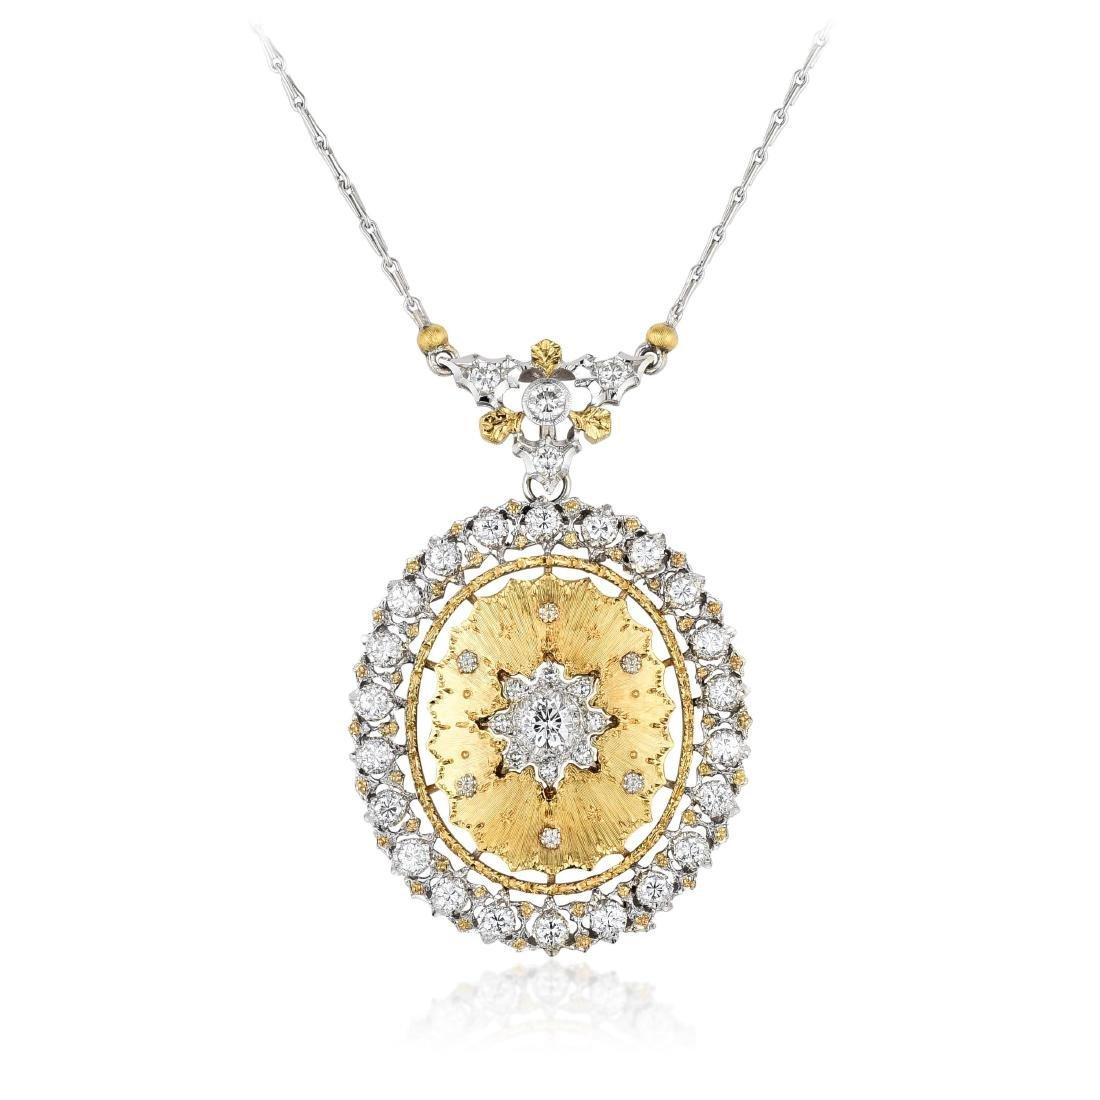 Buccellati Gold Diamond Pendant Necklace / Brooch